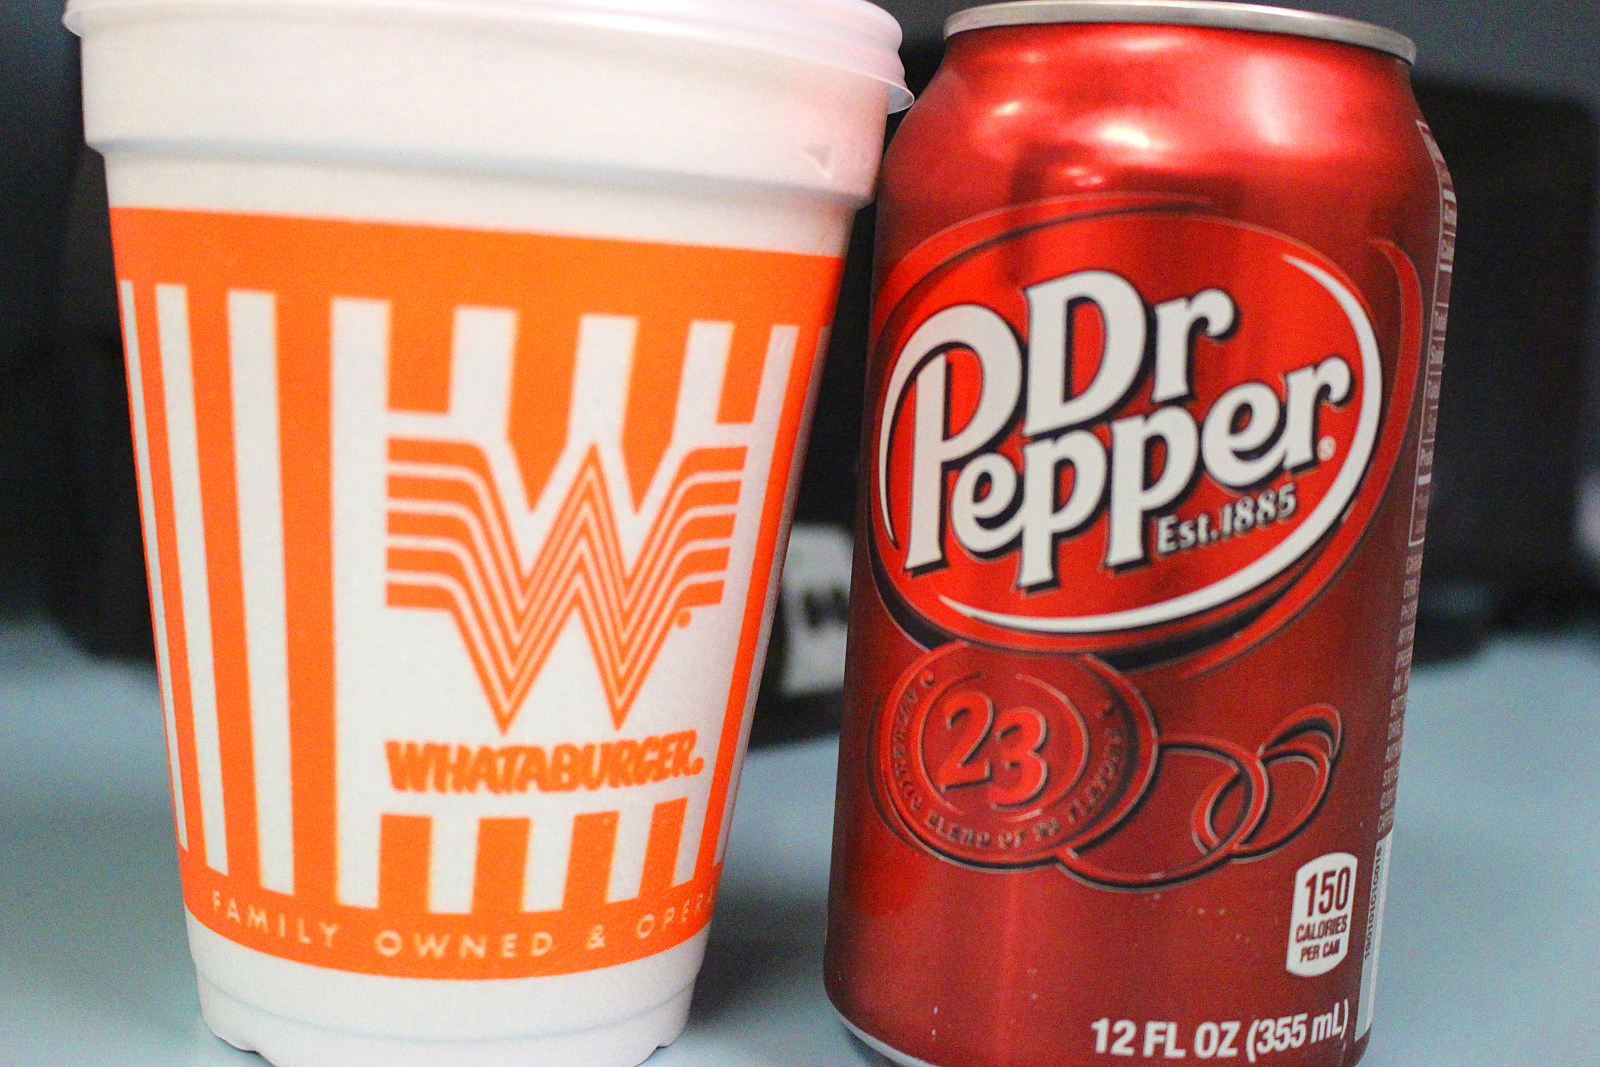 We Taste Tested the New Dr Pepper Shake at Whataburger